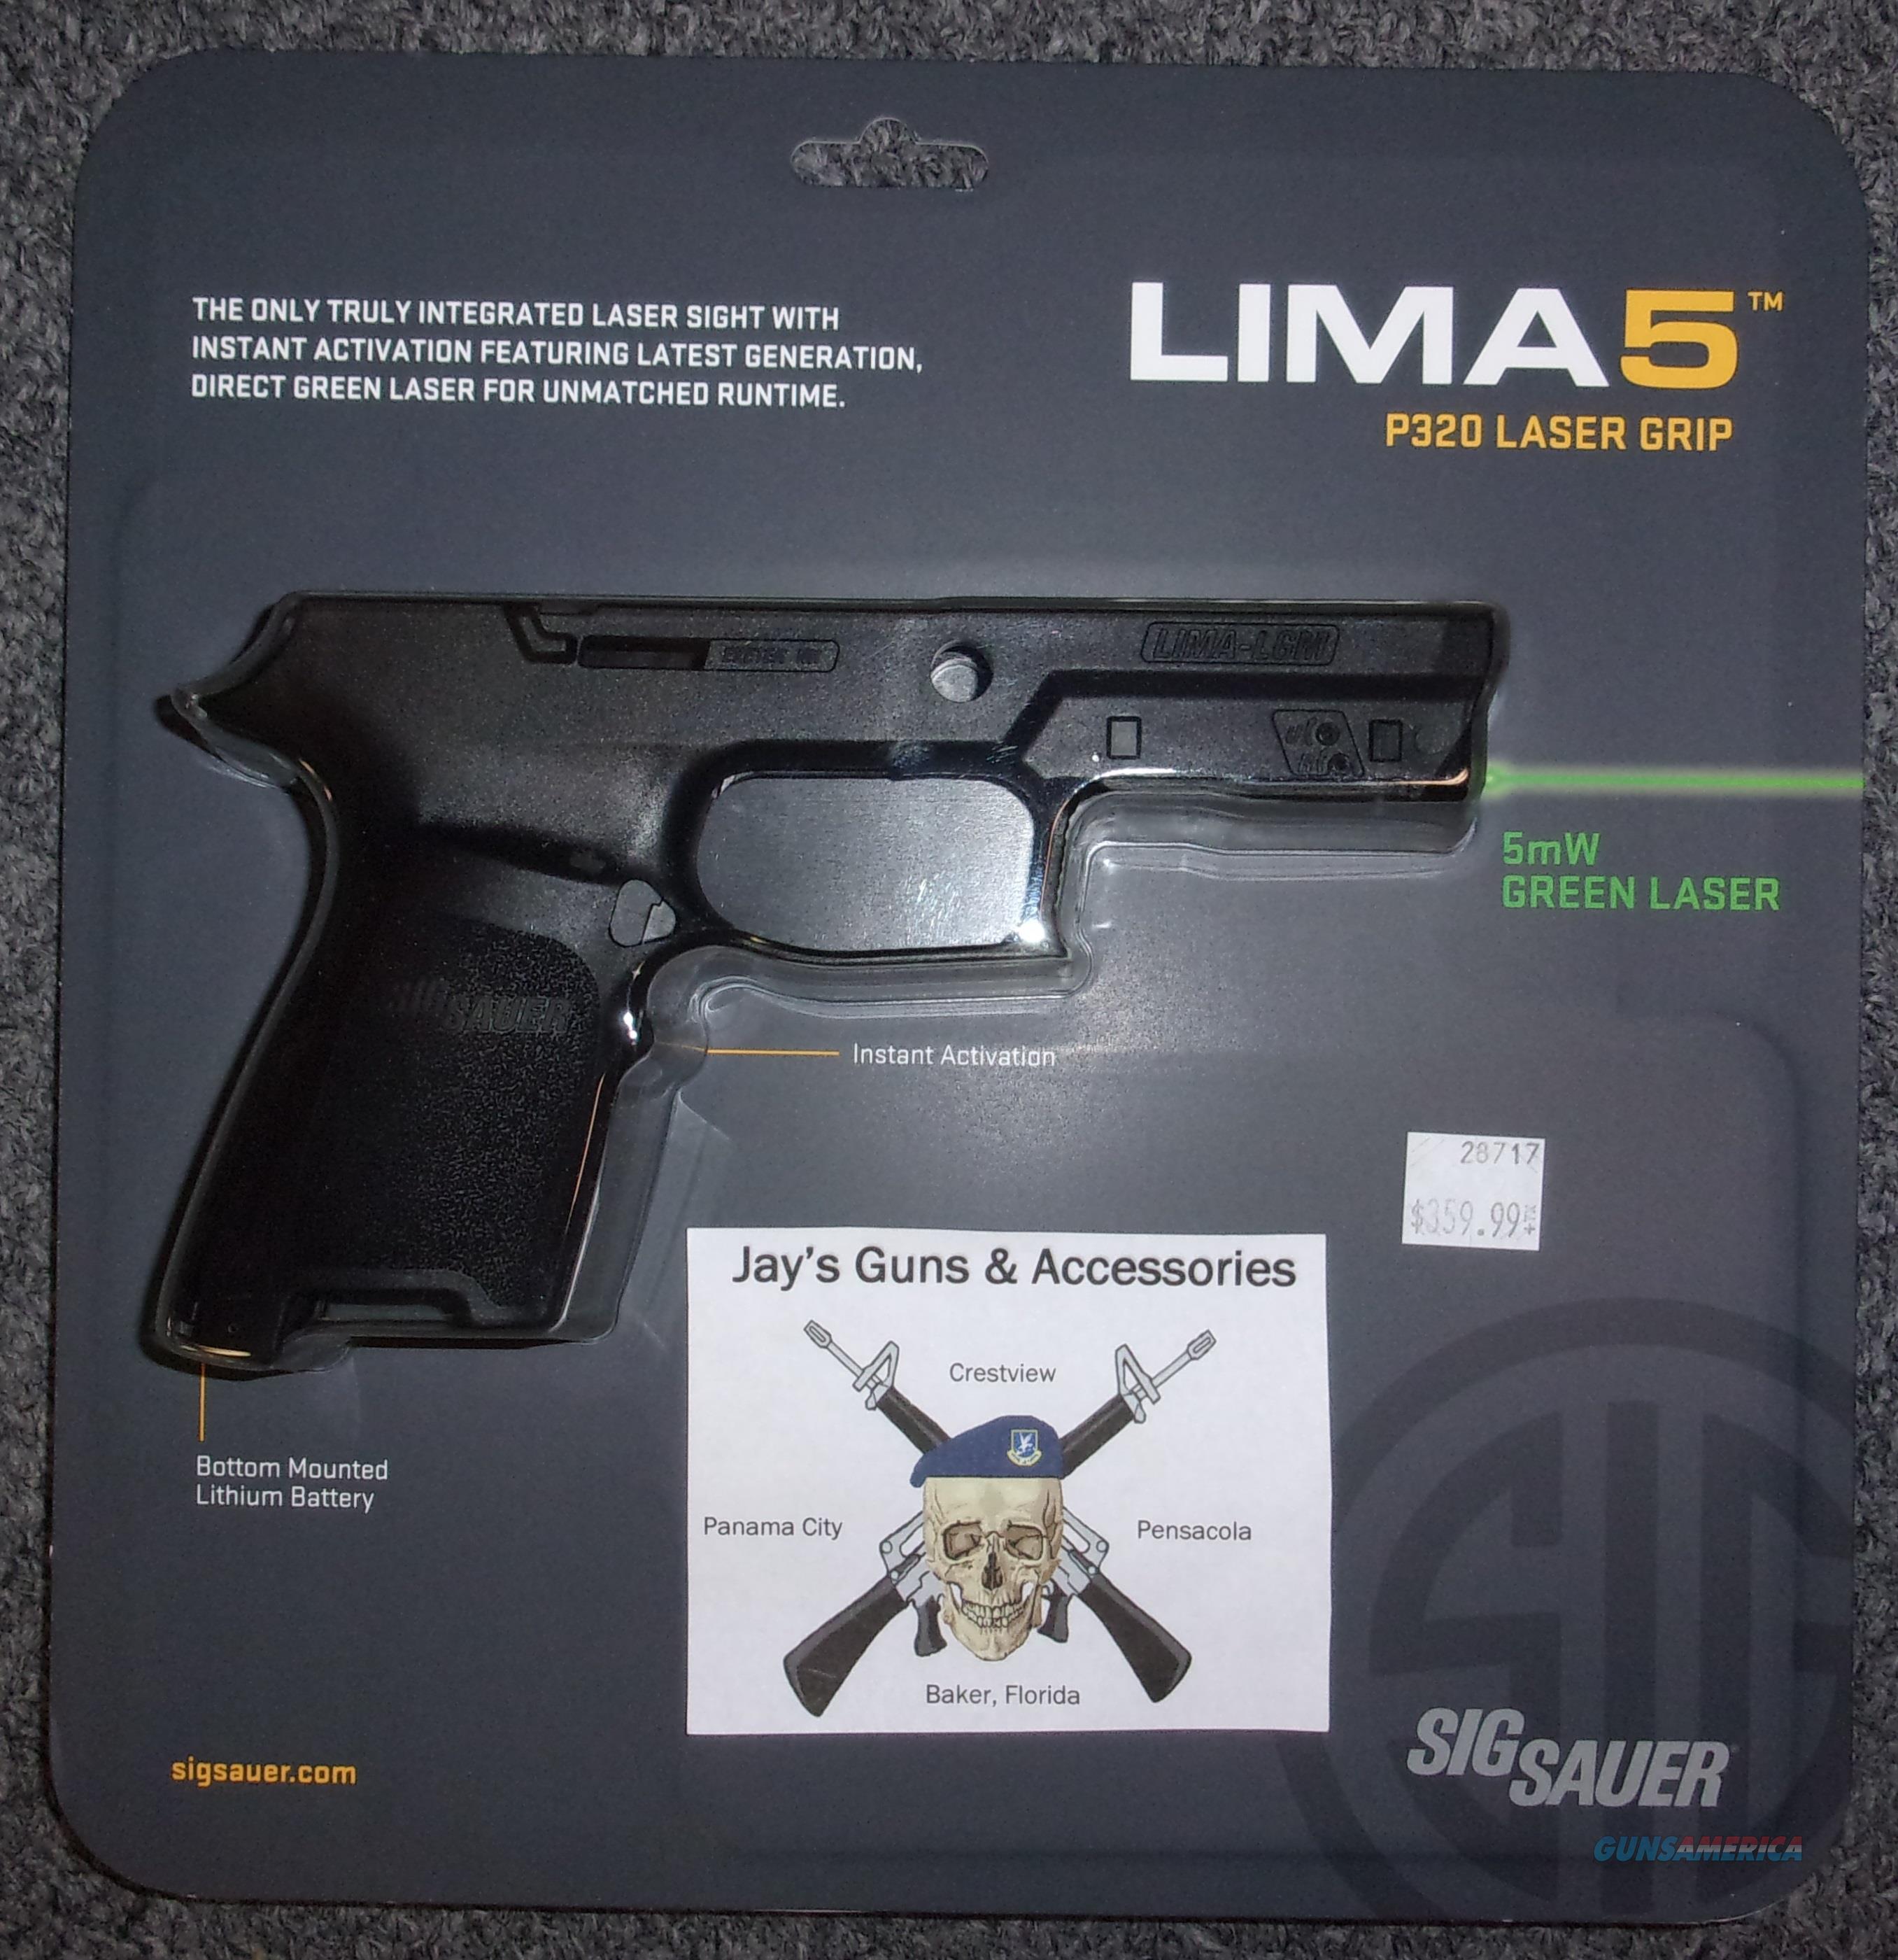 Sig Sauer LIMA5 P320 Laser Grip - Green Laser  Non-Guns > Gunstocks, Grips & Wood